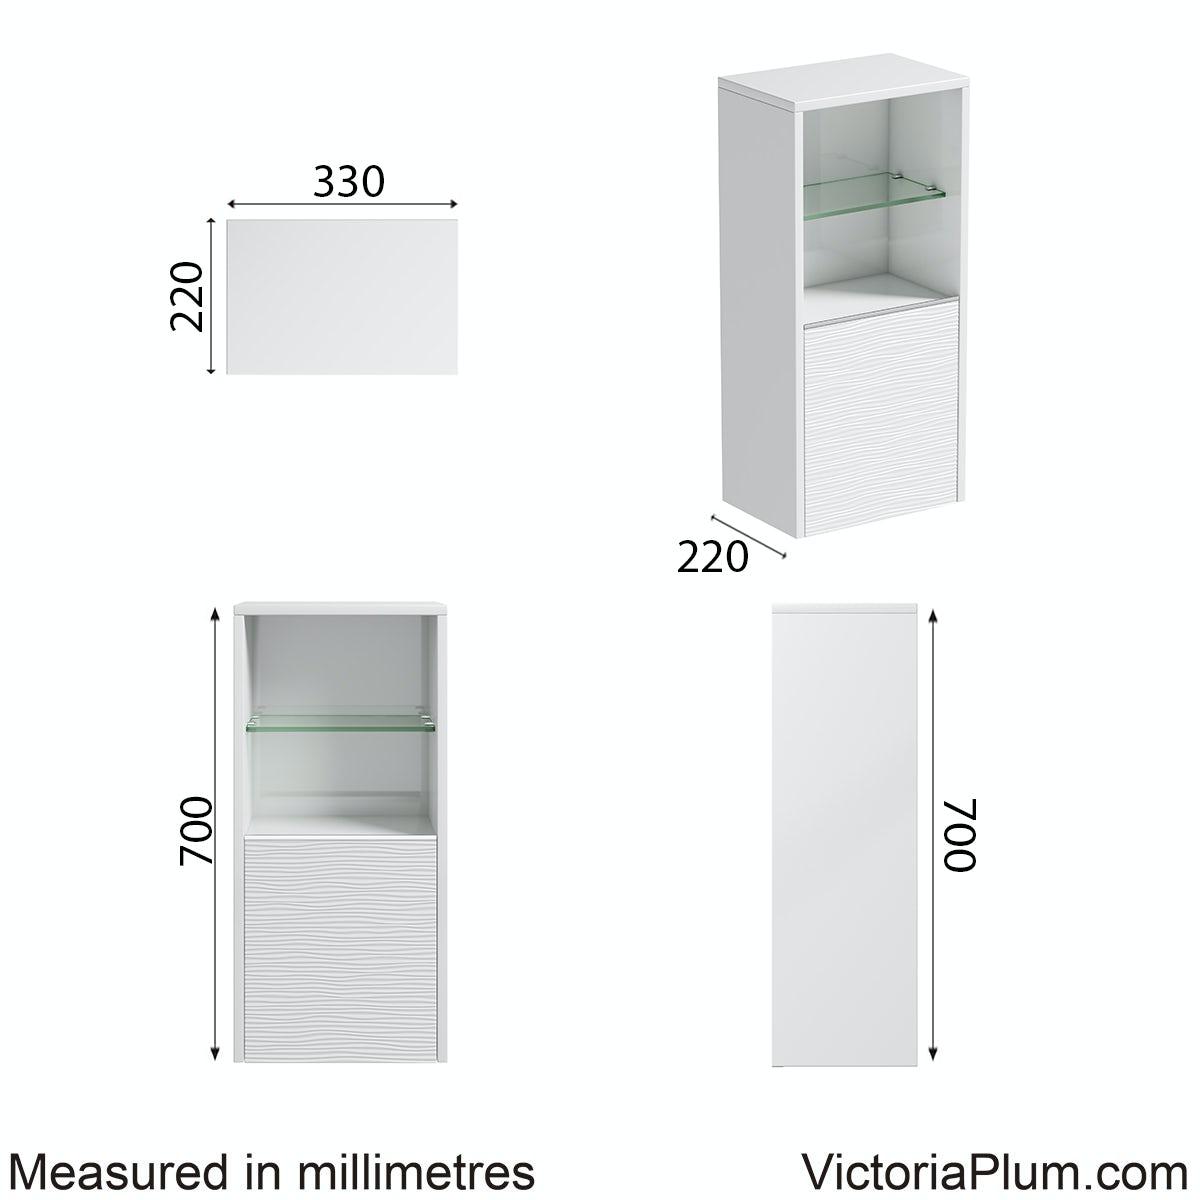 Dimensions for Mode Banks matt white wall storage unit 330mm